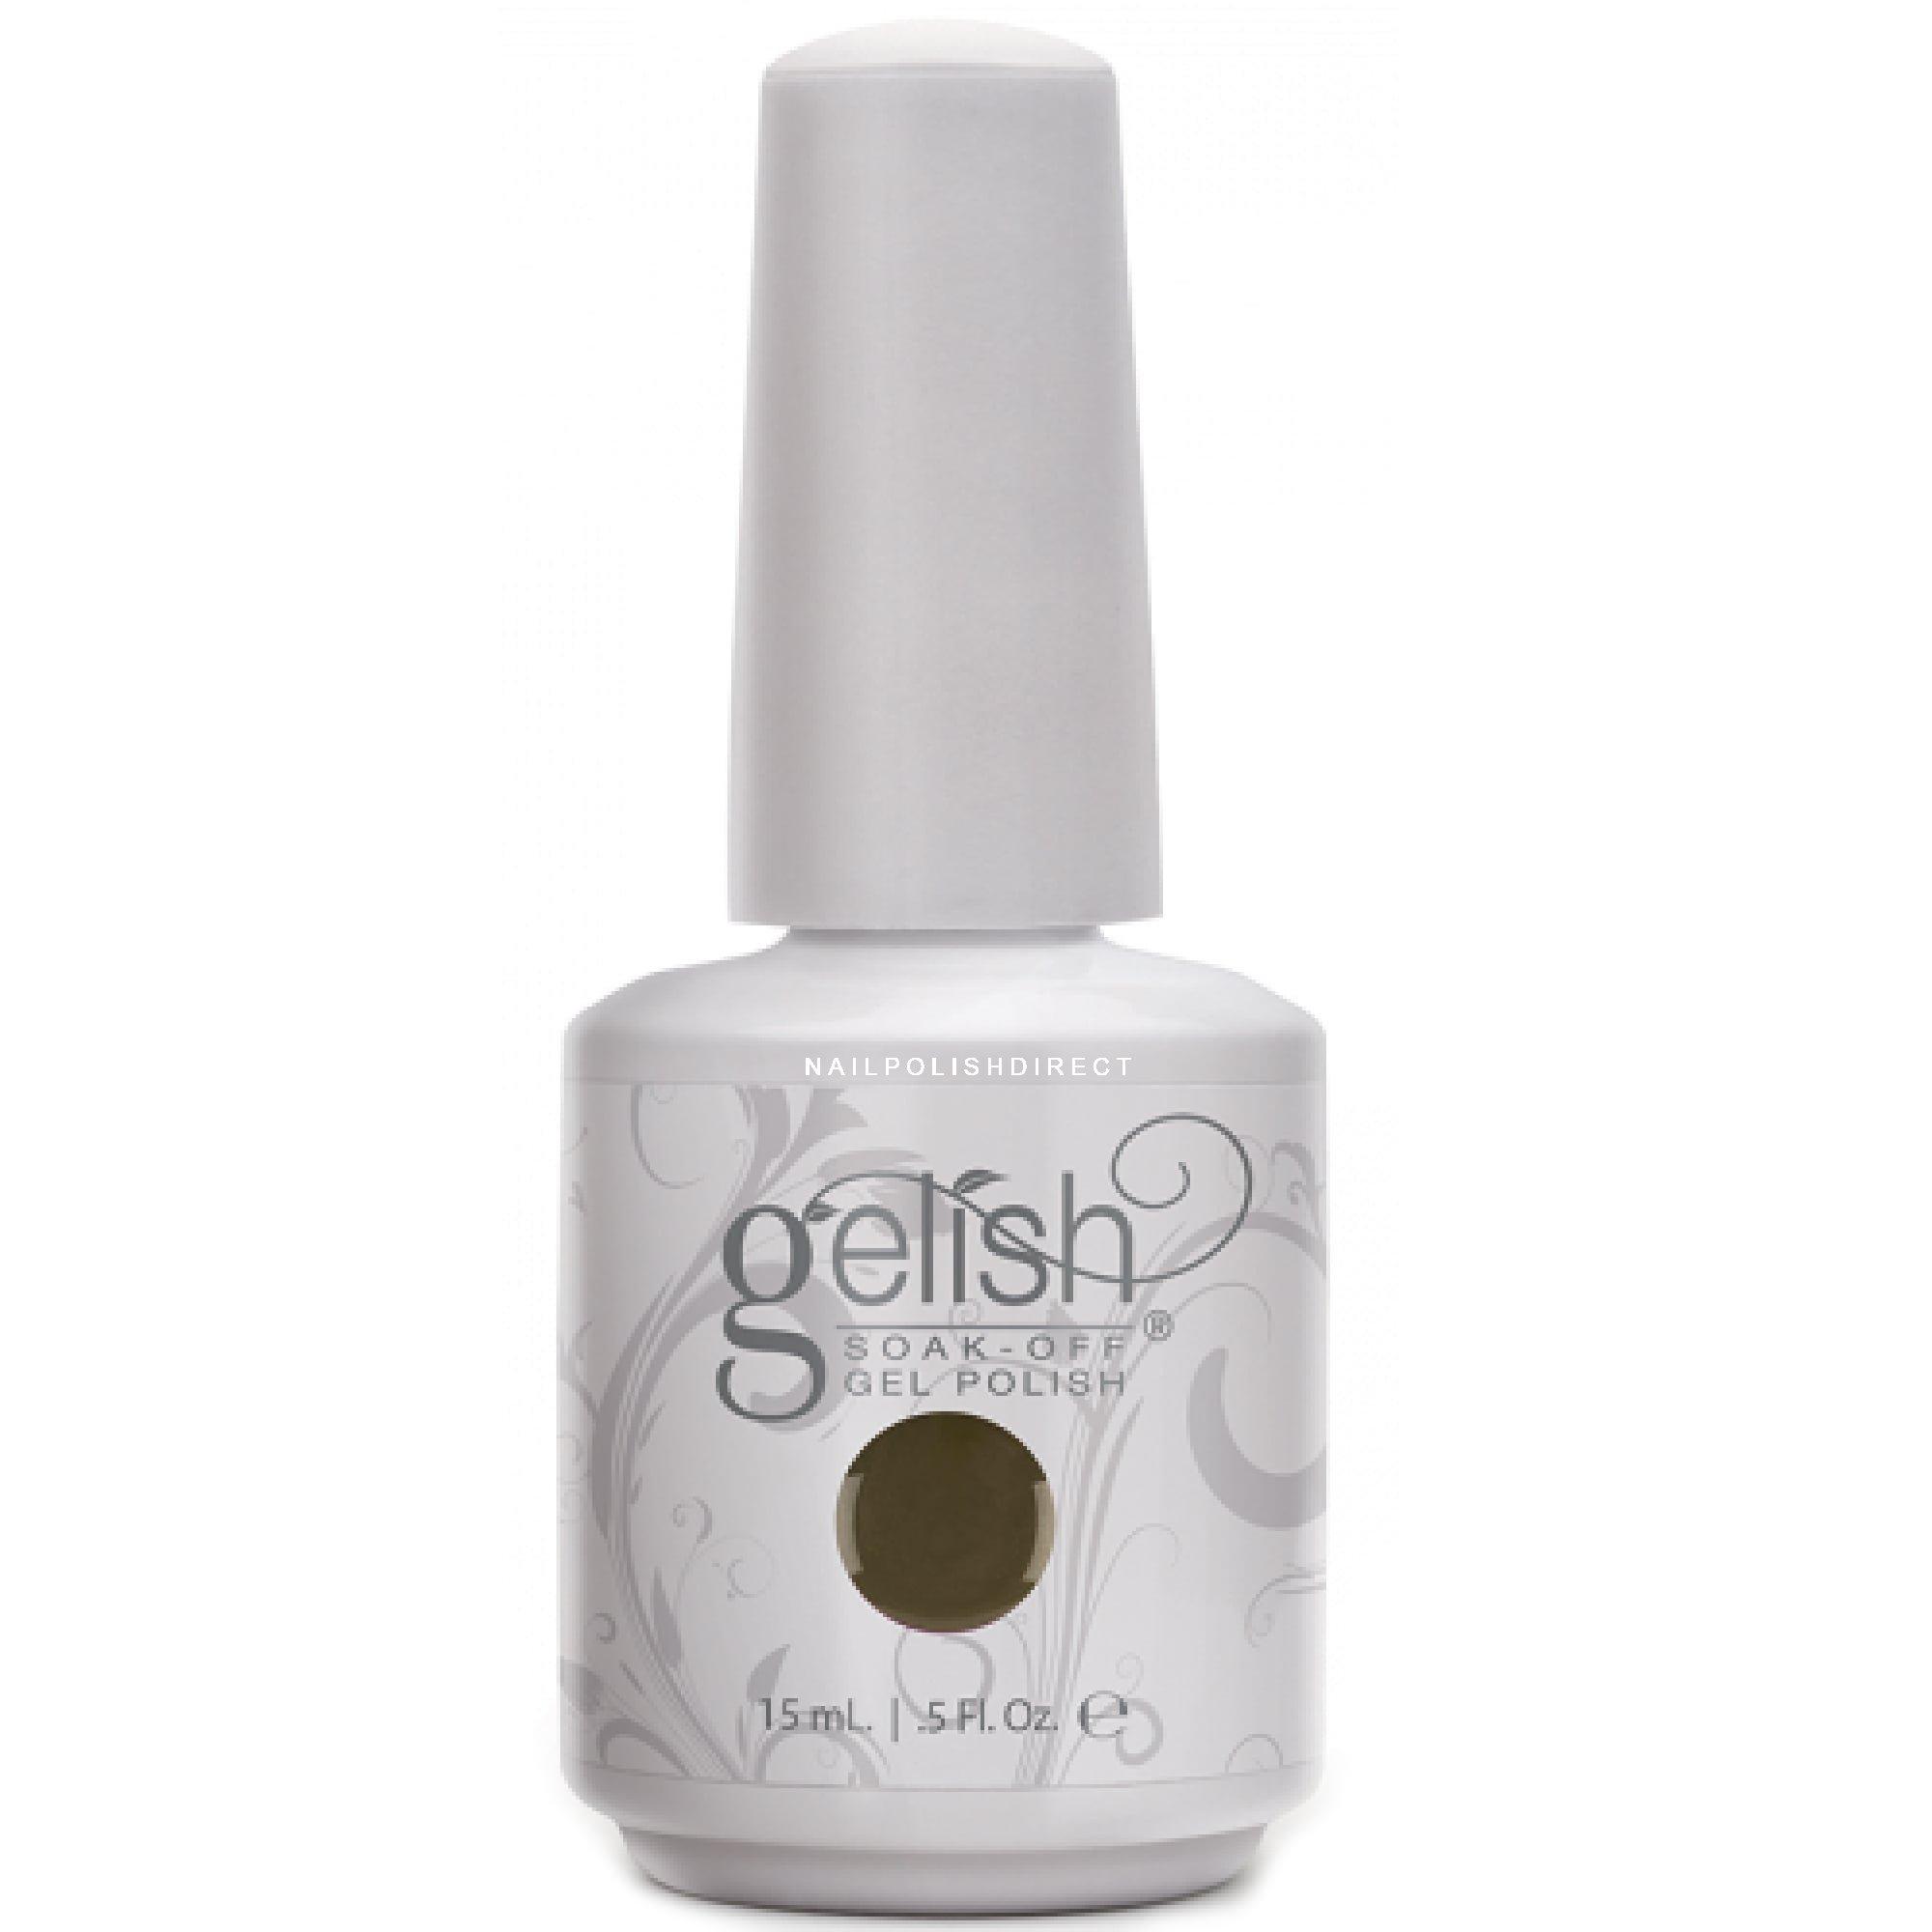 Gelish Soak-Off Gel Nail Polish - Olive You 15ml